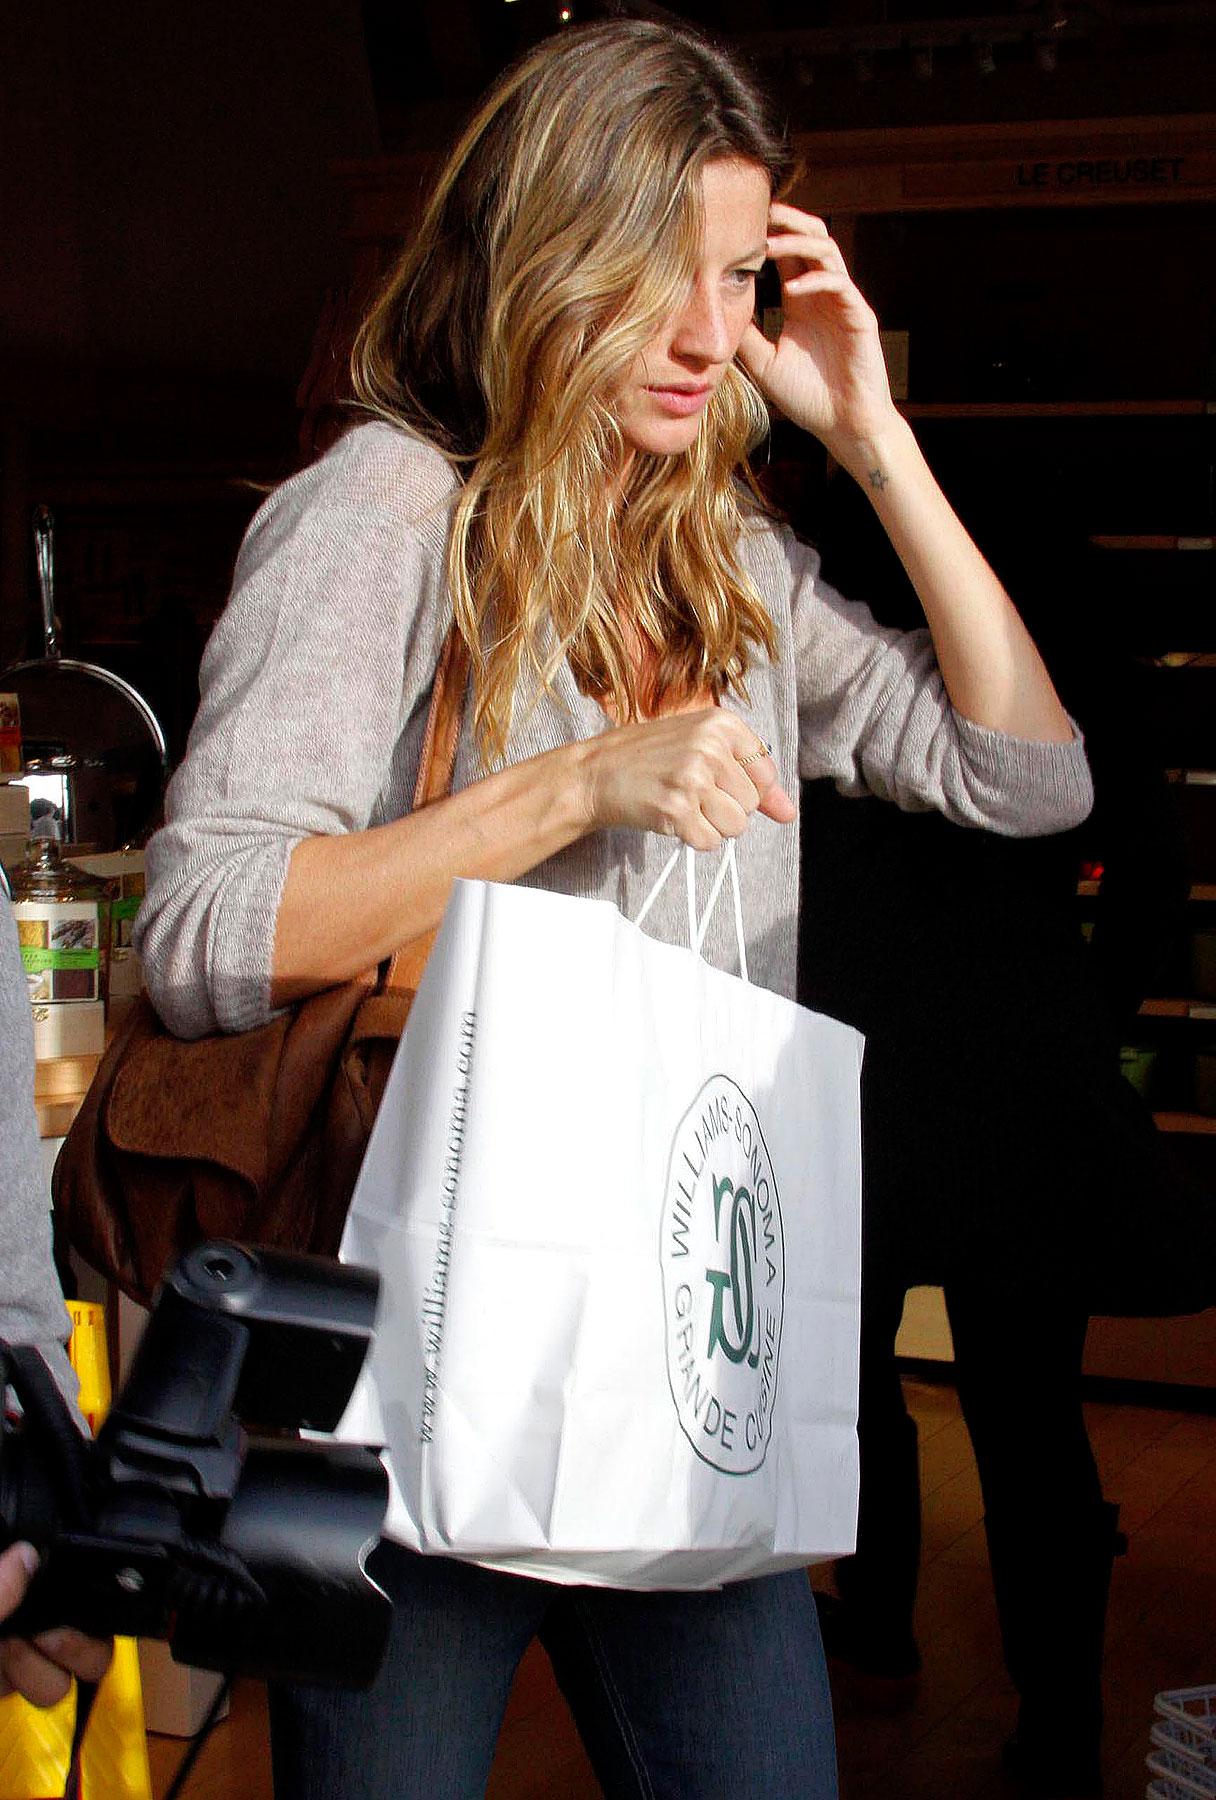 Tom Brady and Gisele Bundchen's Post-Wedding Retail Session